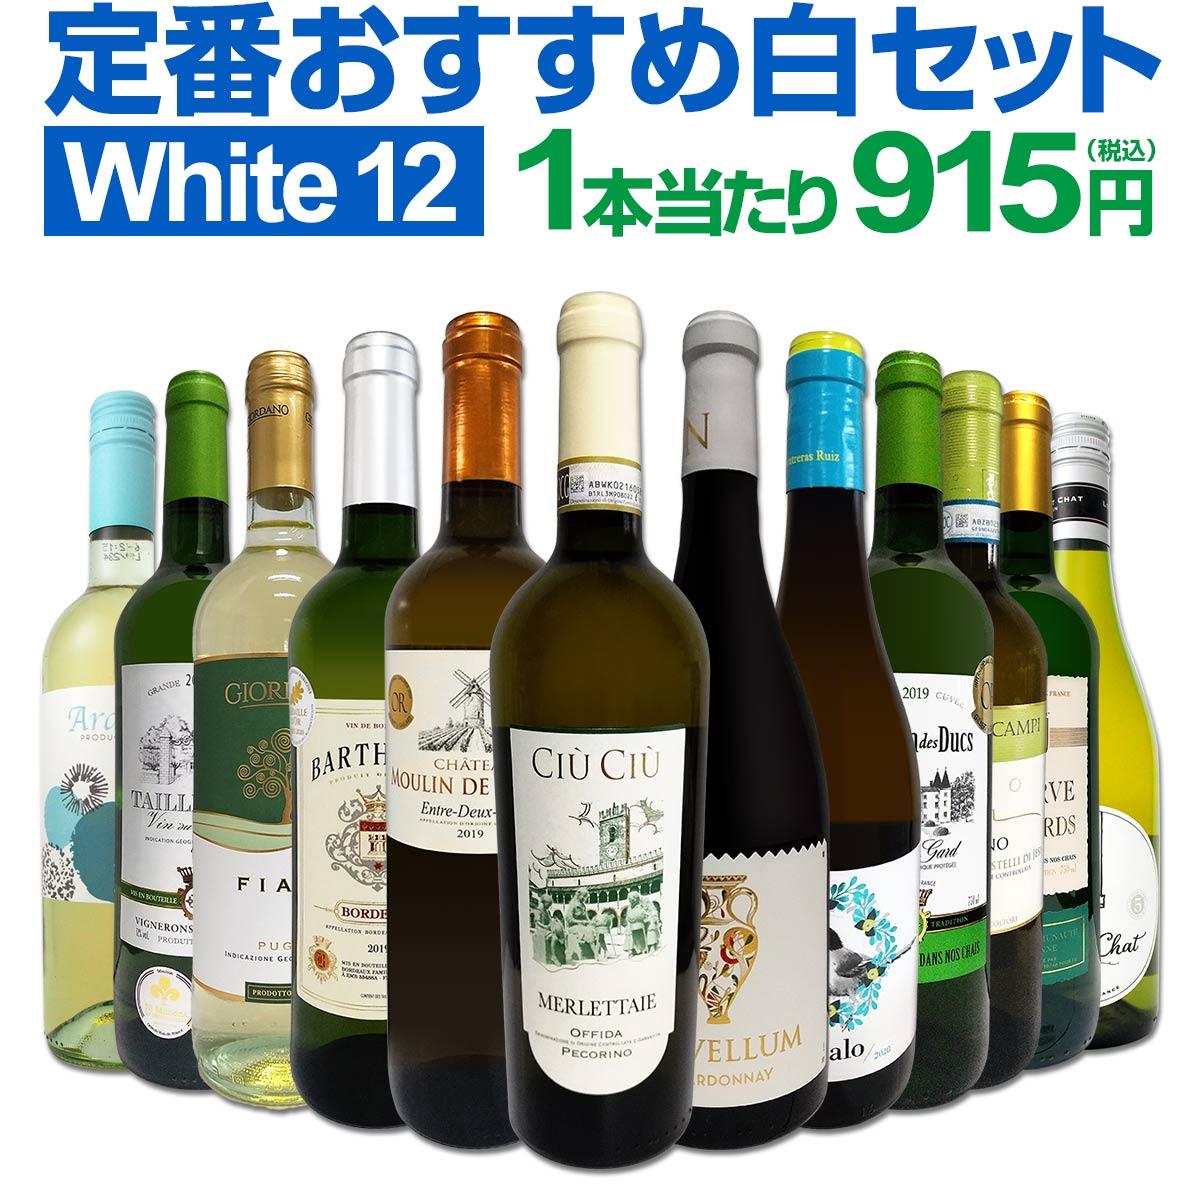 white12